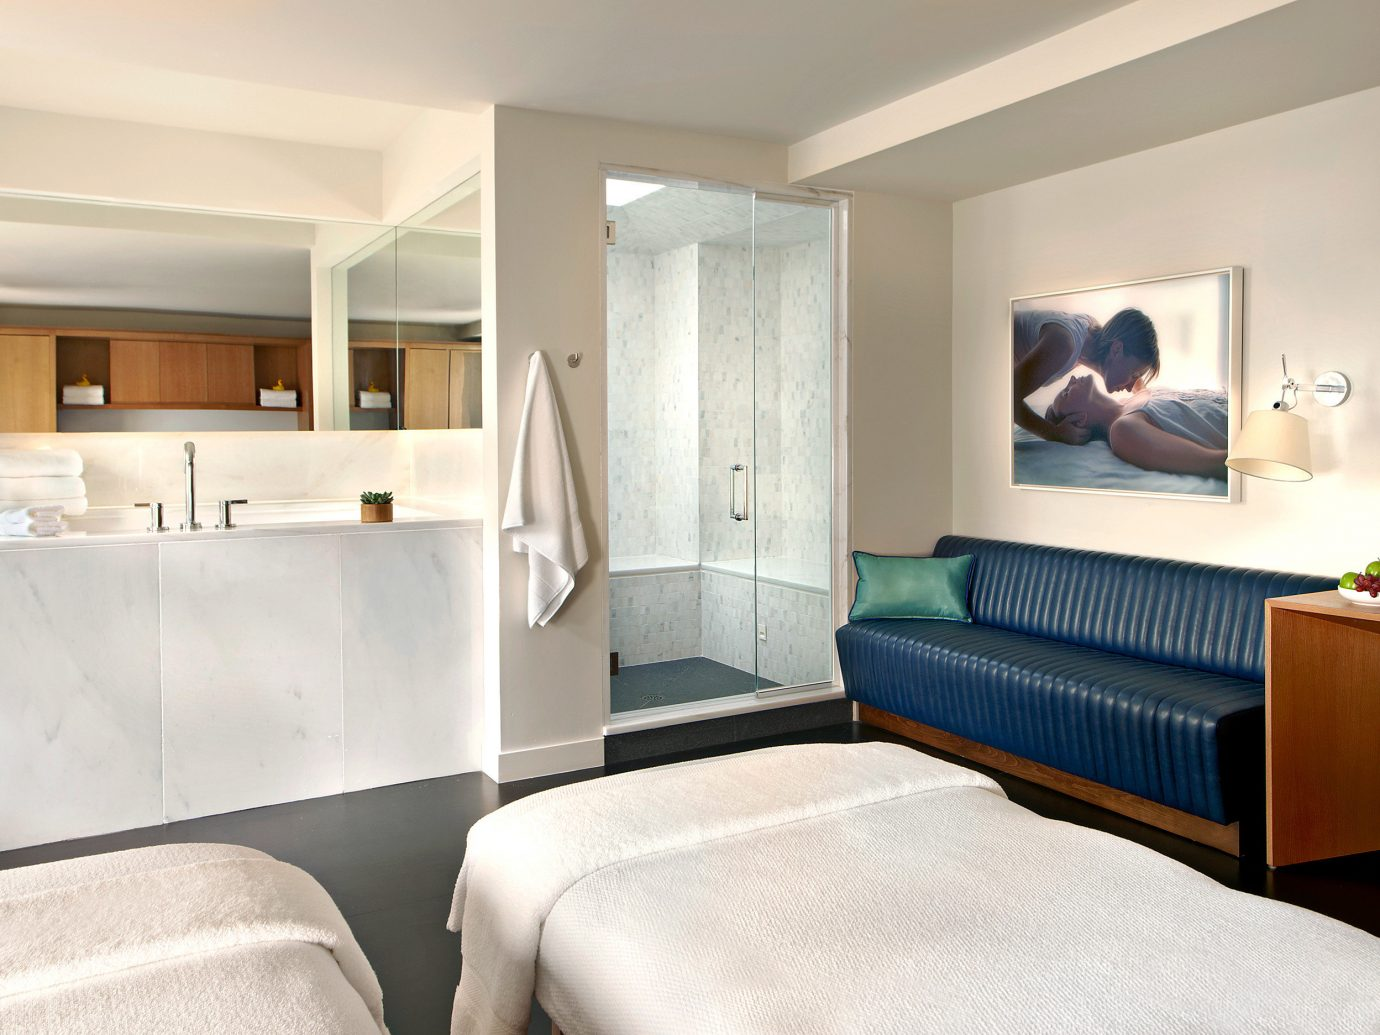 21c Museum Hotel Cincinnati guestroom